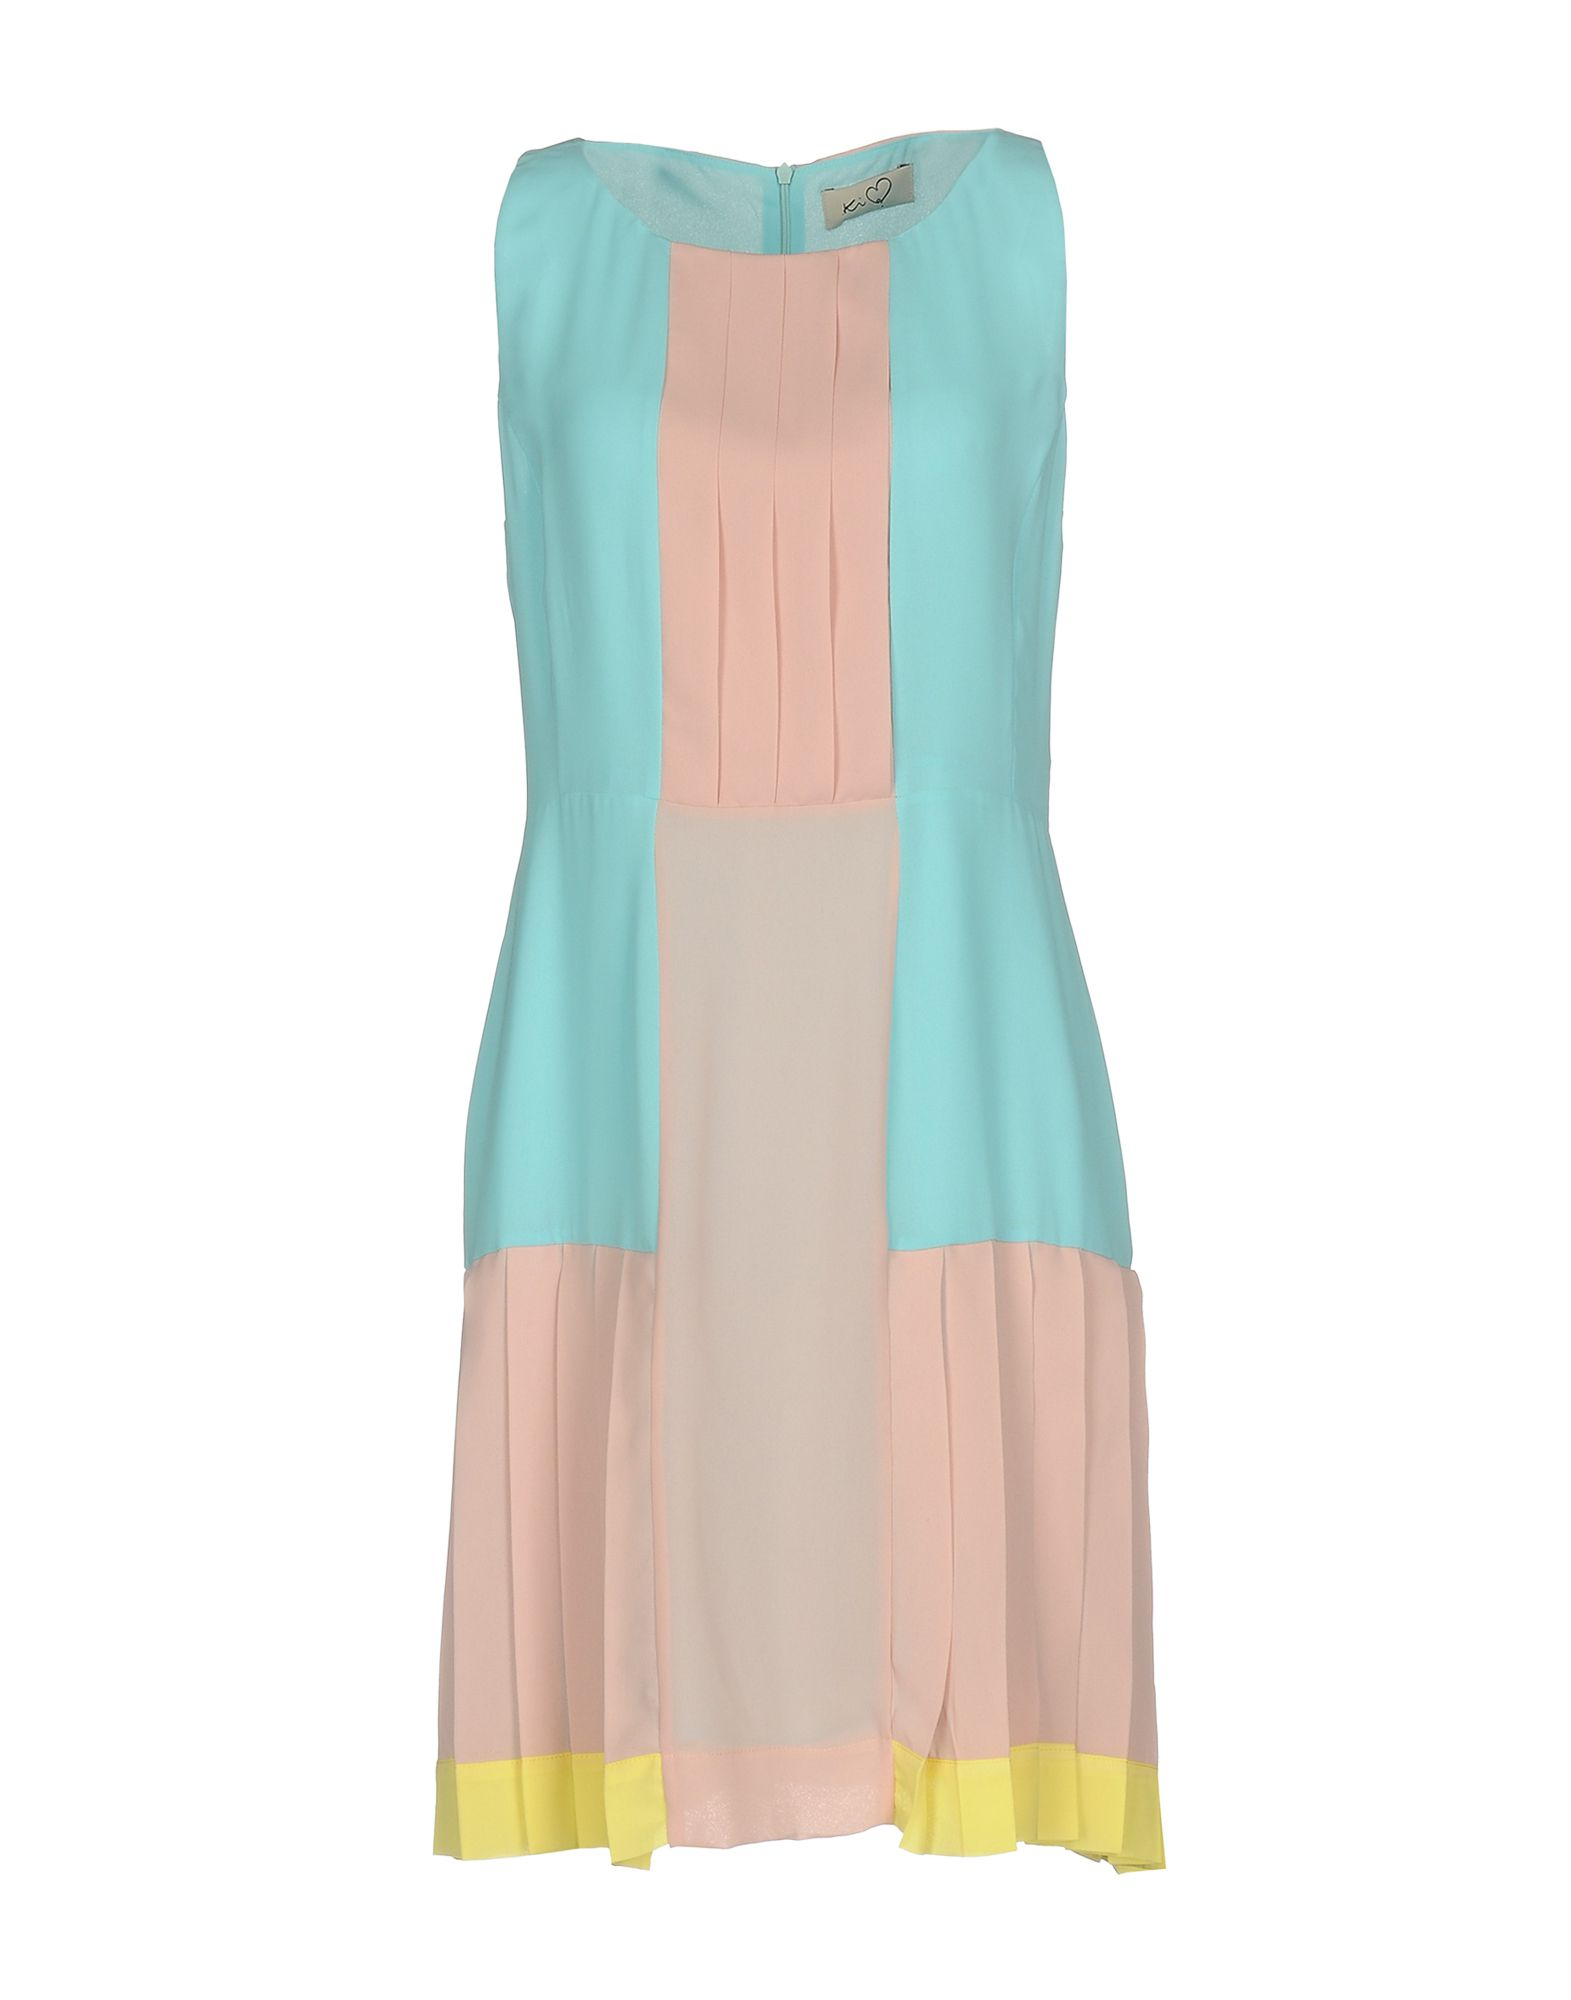 KI6? WHO ARE YOU? Короткое платье